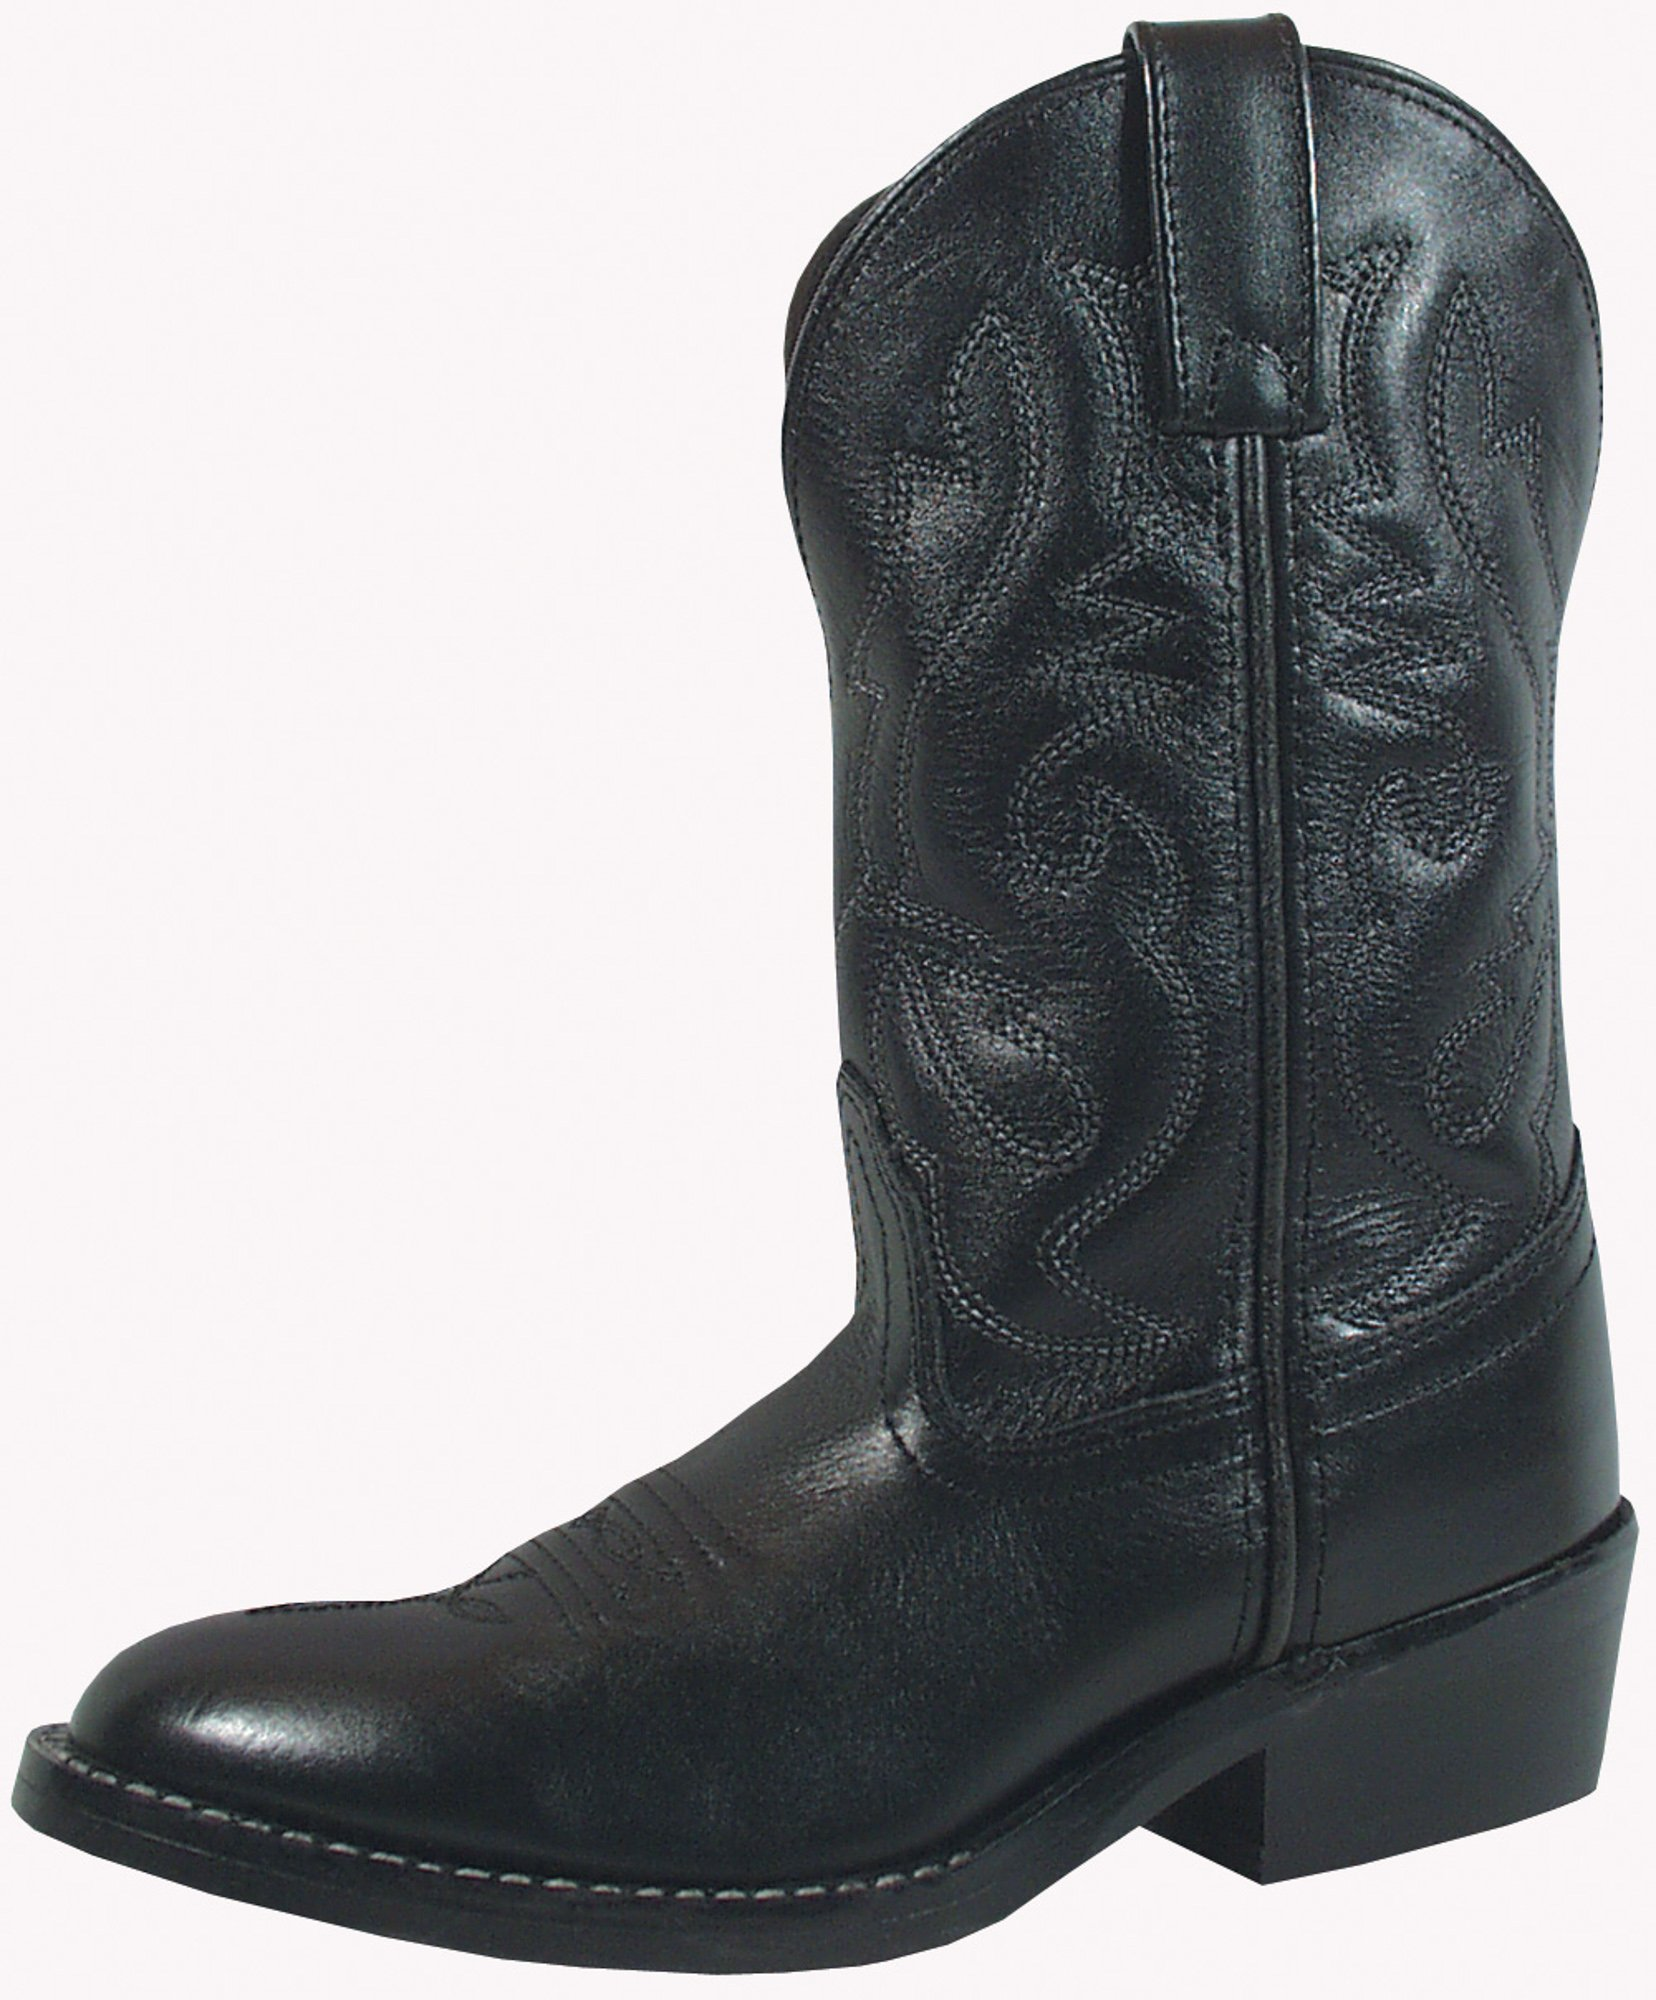 Smoky Children's Kid's Black Leather Western Cowboy Boot